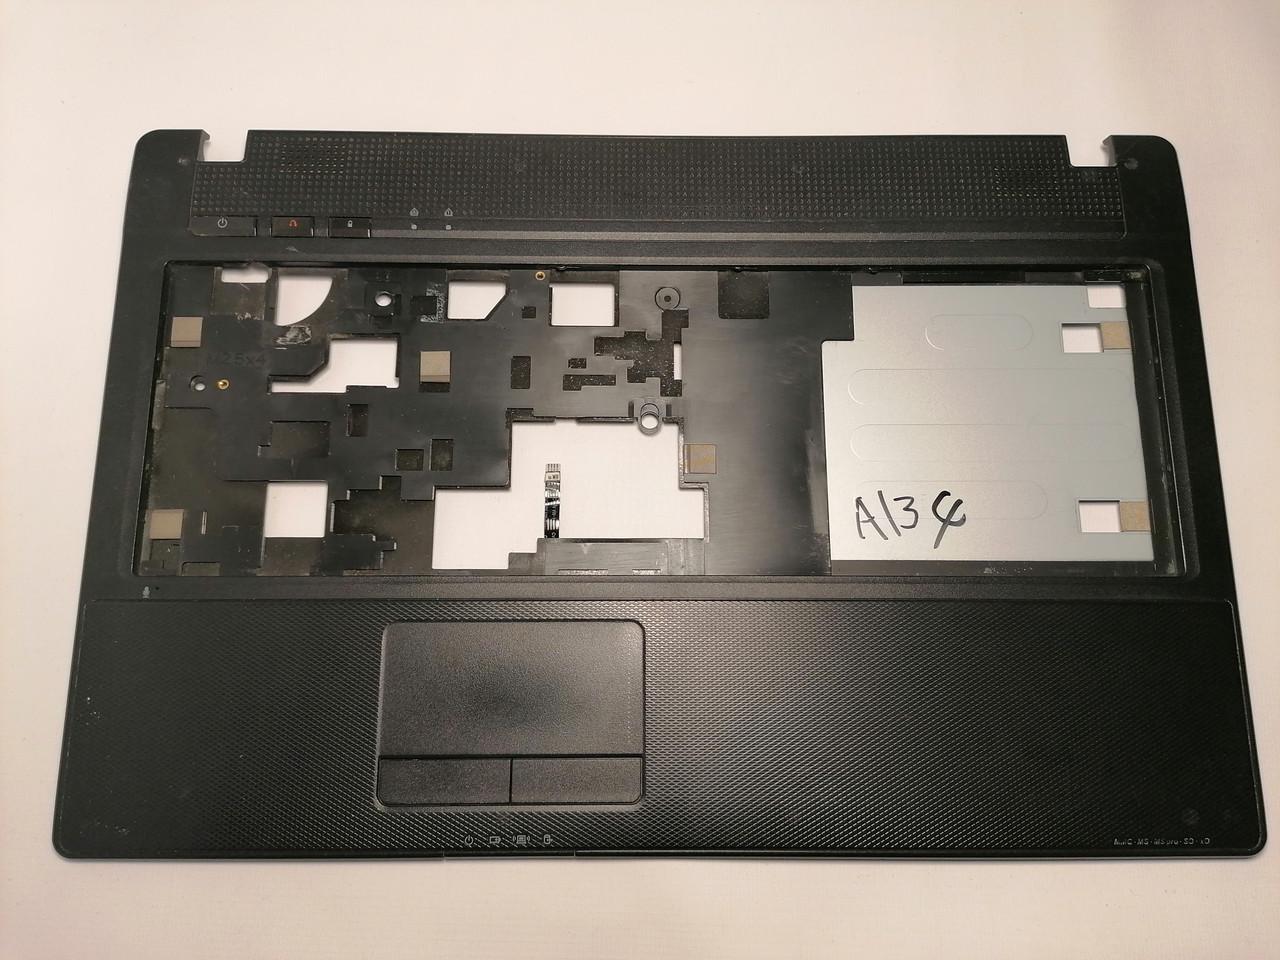 Б/У корпус крышка клавиатуры (топкейс) для LENOVO G560 G565 (AP0EZ000200)